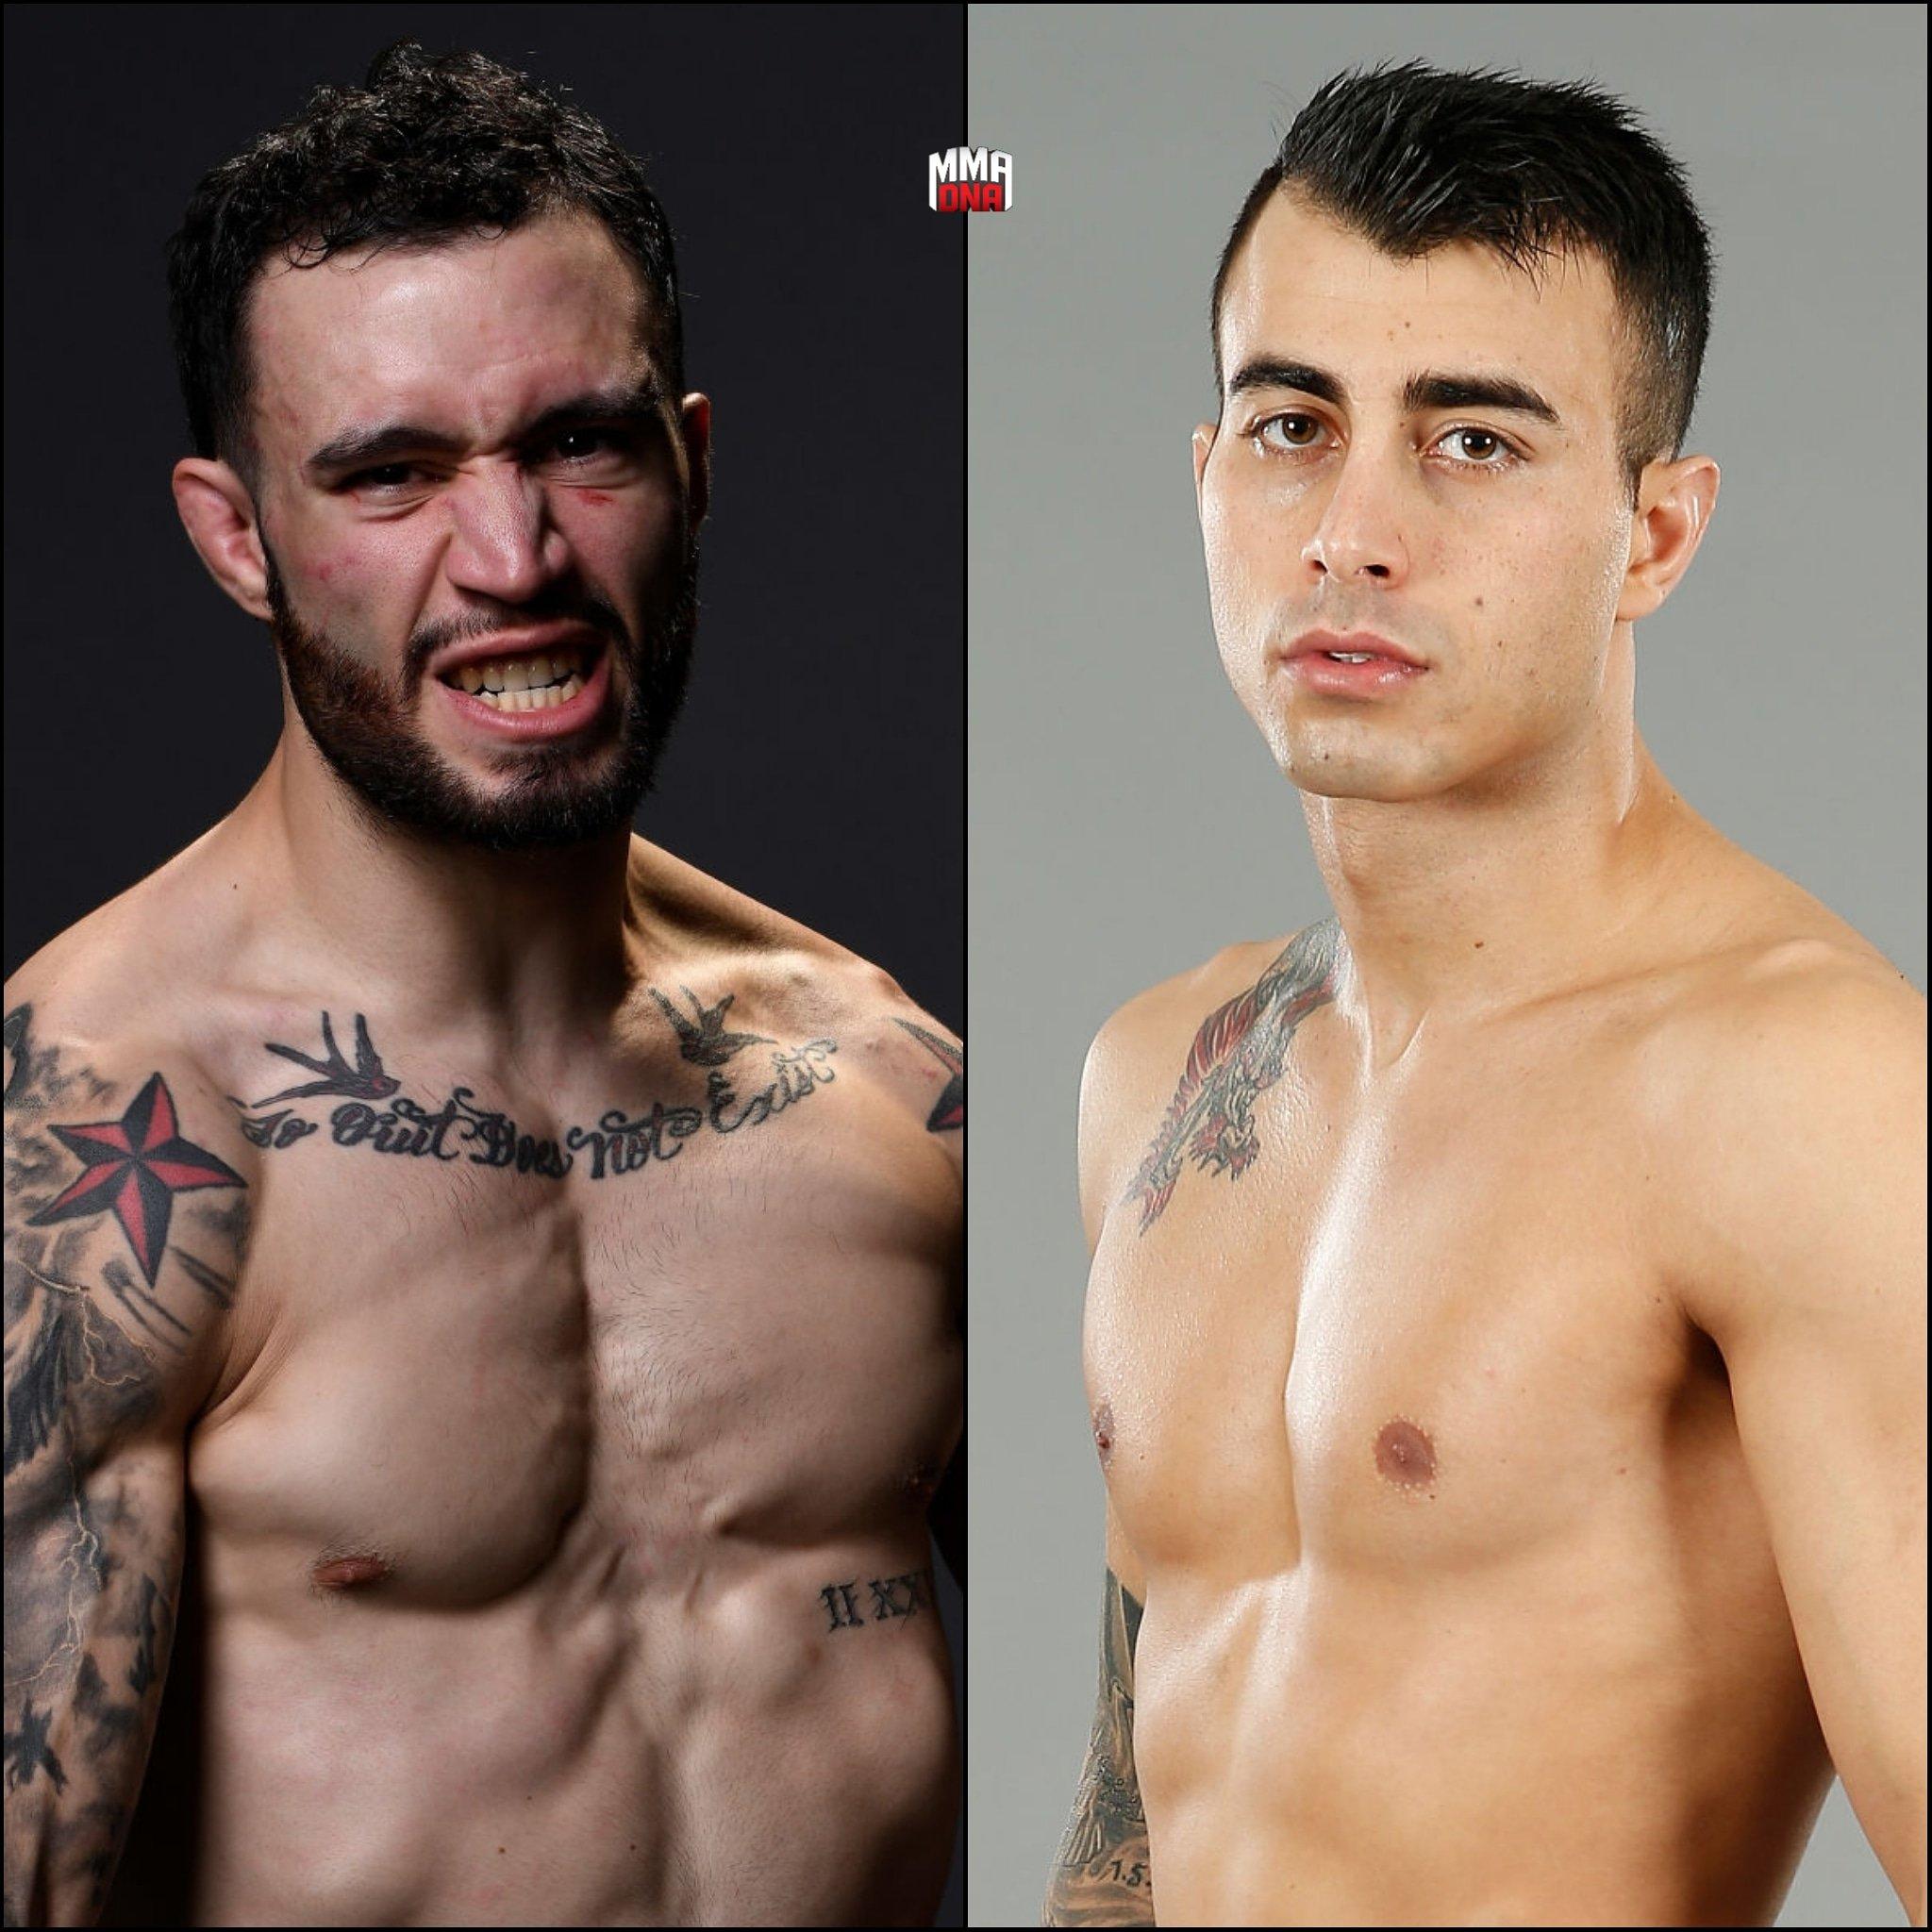 Shane Burgos (@HurricaneShaneB) will fight Makwan Amirkhani (@MakwanAmirkhani) at #UFC244 in New York, New York. (Nov. 2, 2019). (per @NewsdaySports) #UFC #UFCNYC #UFCNewYork #MMA #UFCESPN https://t.co/ty7BrMDa5K